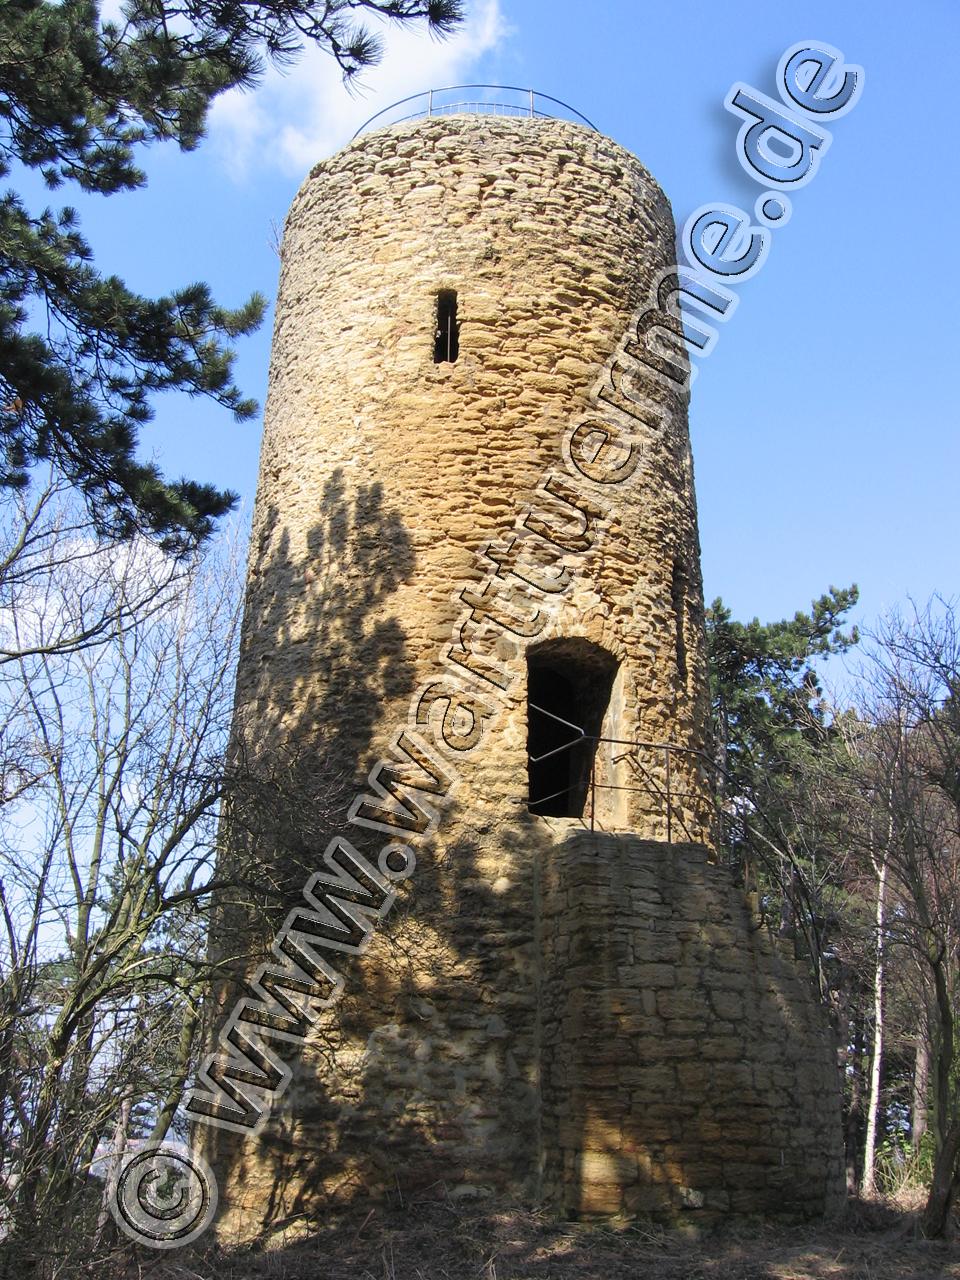 sudmerbergturm-1280px